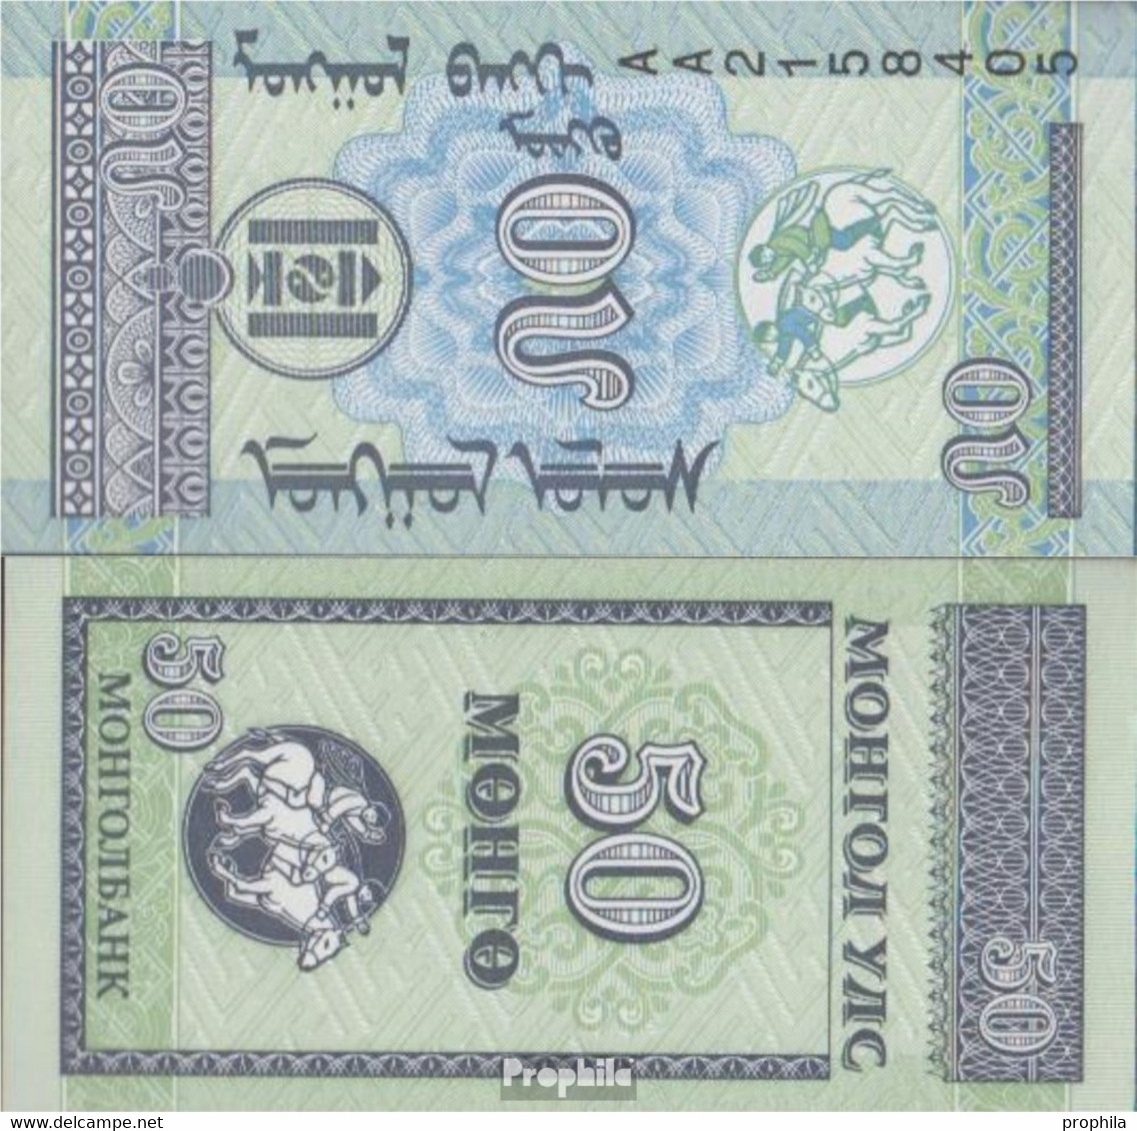 Mongolei Pick-Nr: 51 Bankfrisch 1993 50 Mongo - Mongolia